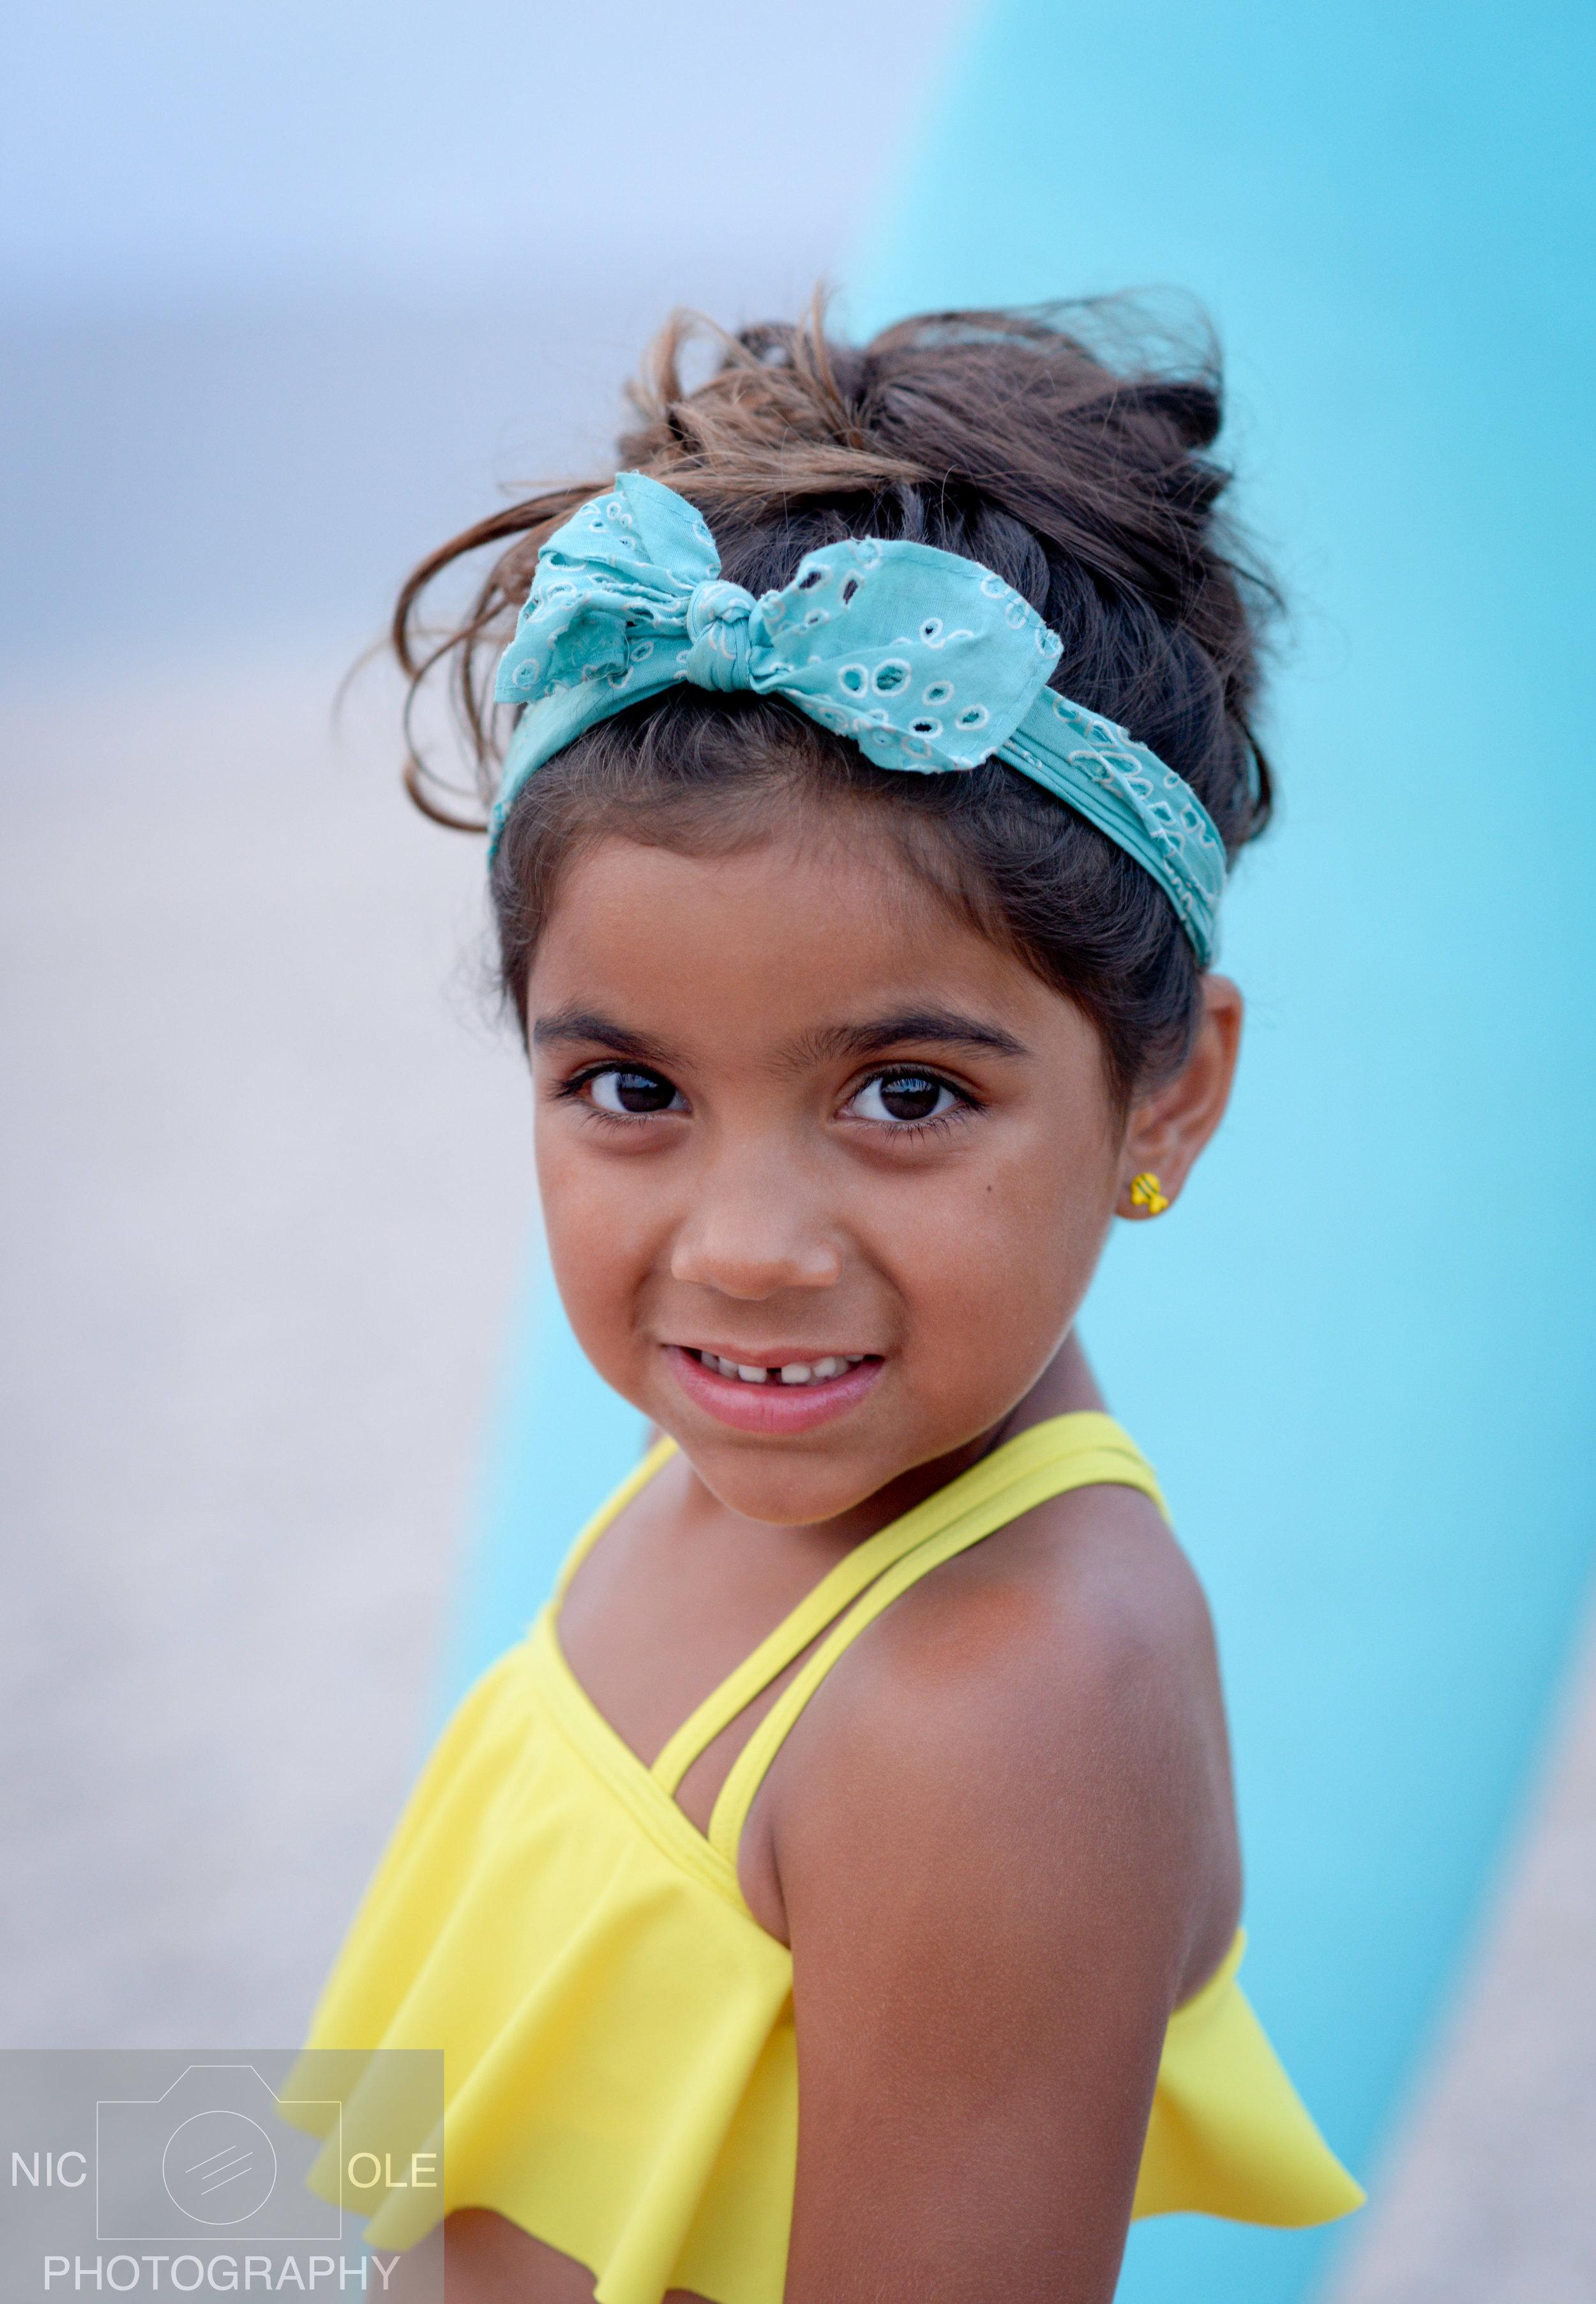 Cielo Noemi Flamingo Beach 7.20.17- NIC-OLE Photography-10.jpg